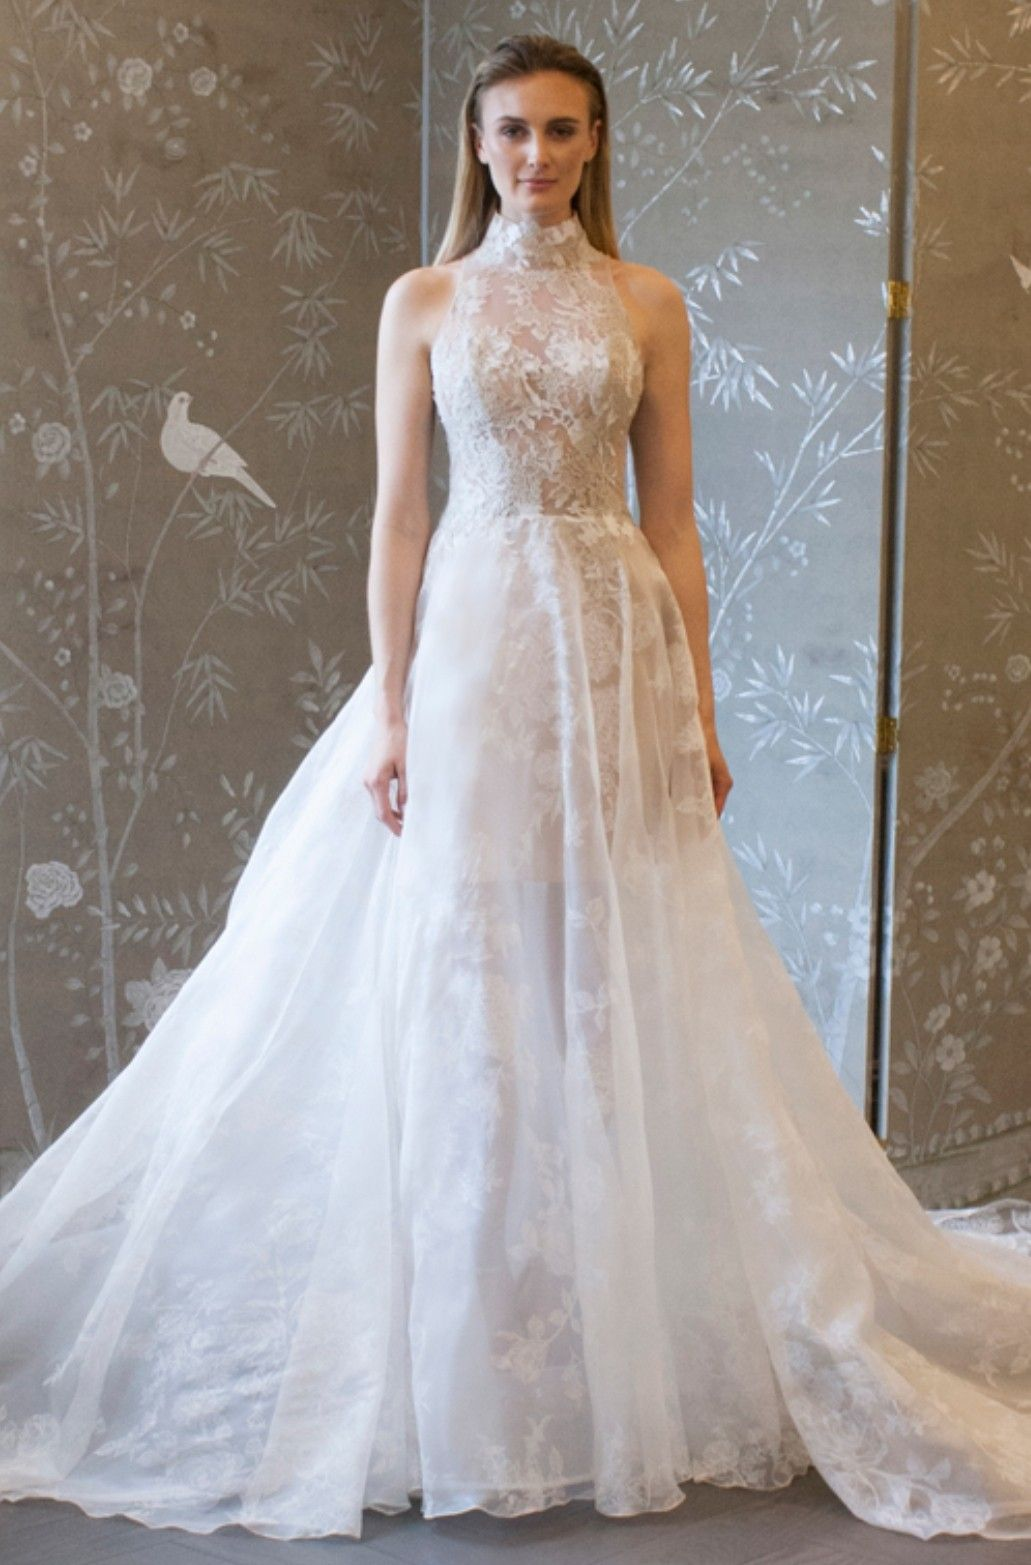 Romona keveža spring bridal bridal gownball gown volume